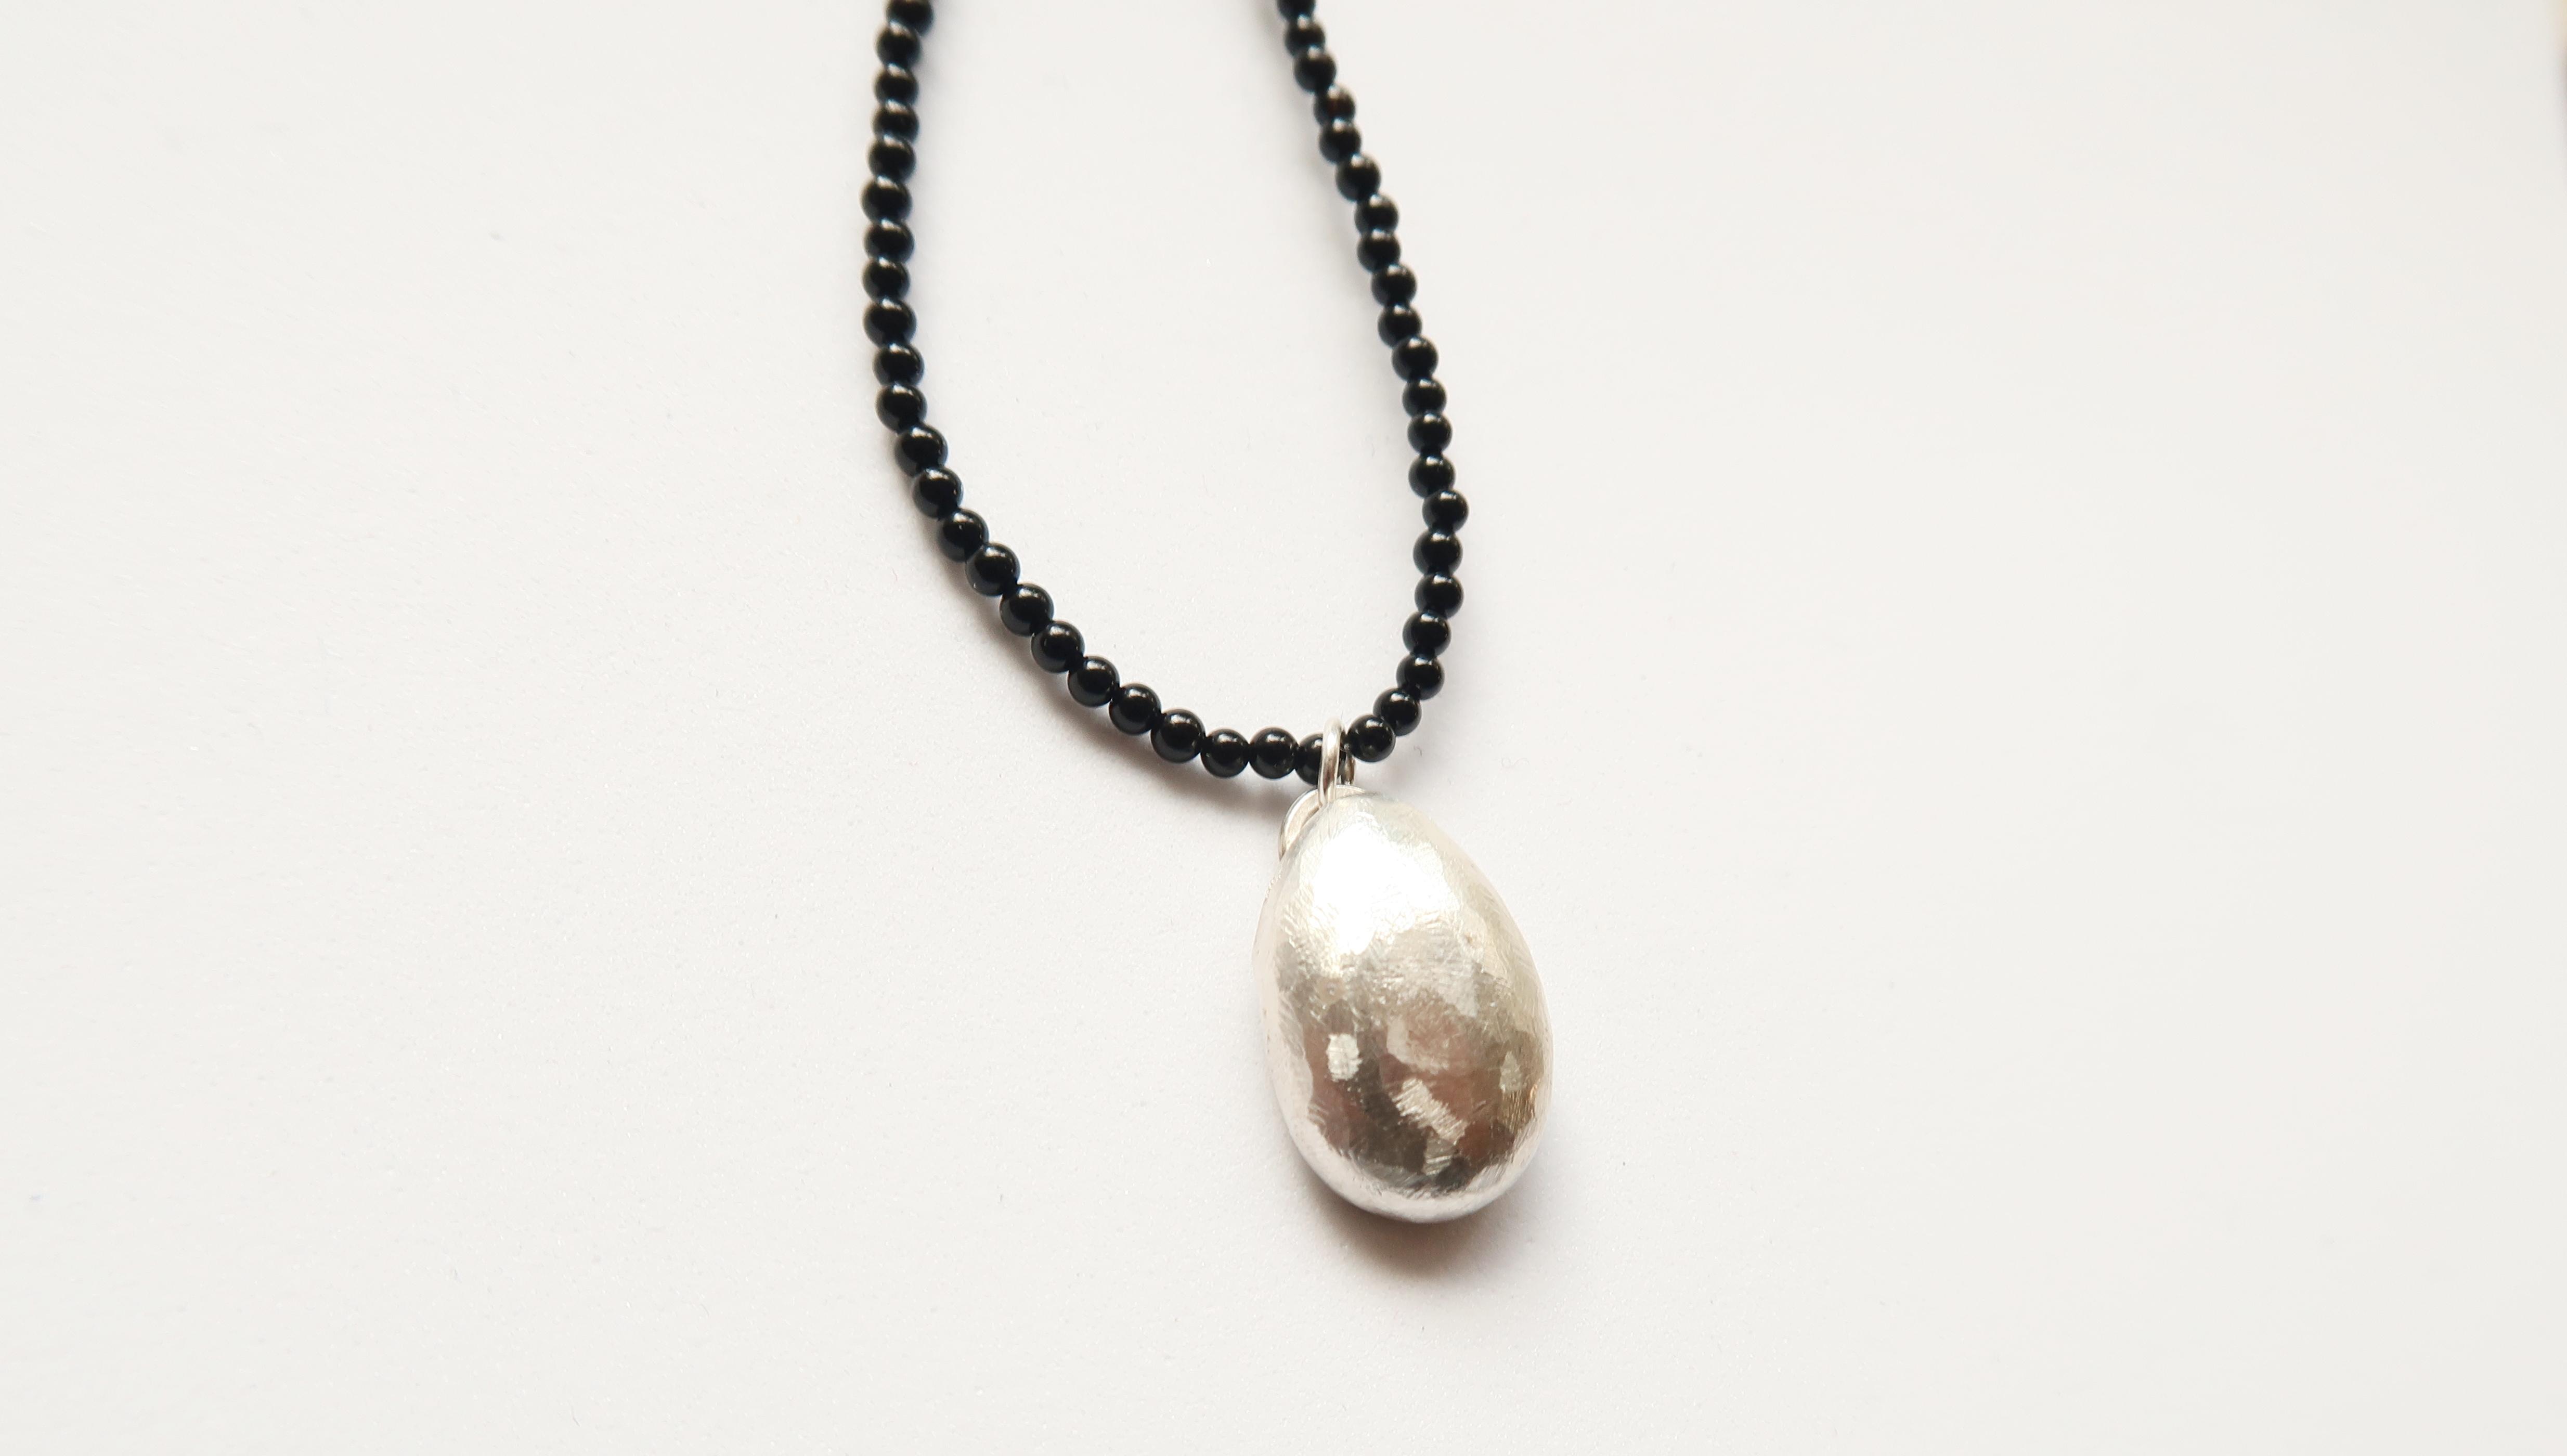 Black Onyx & Silver Egg Pendant